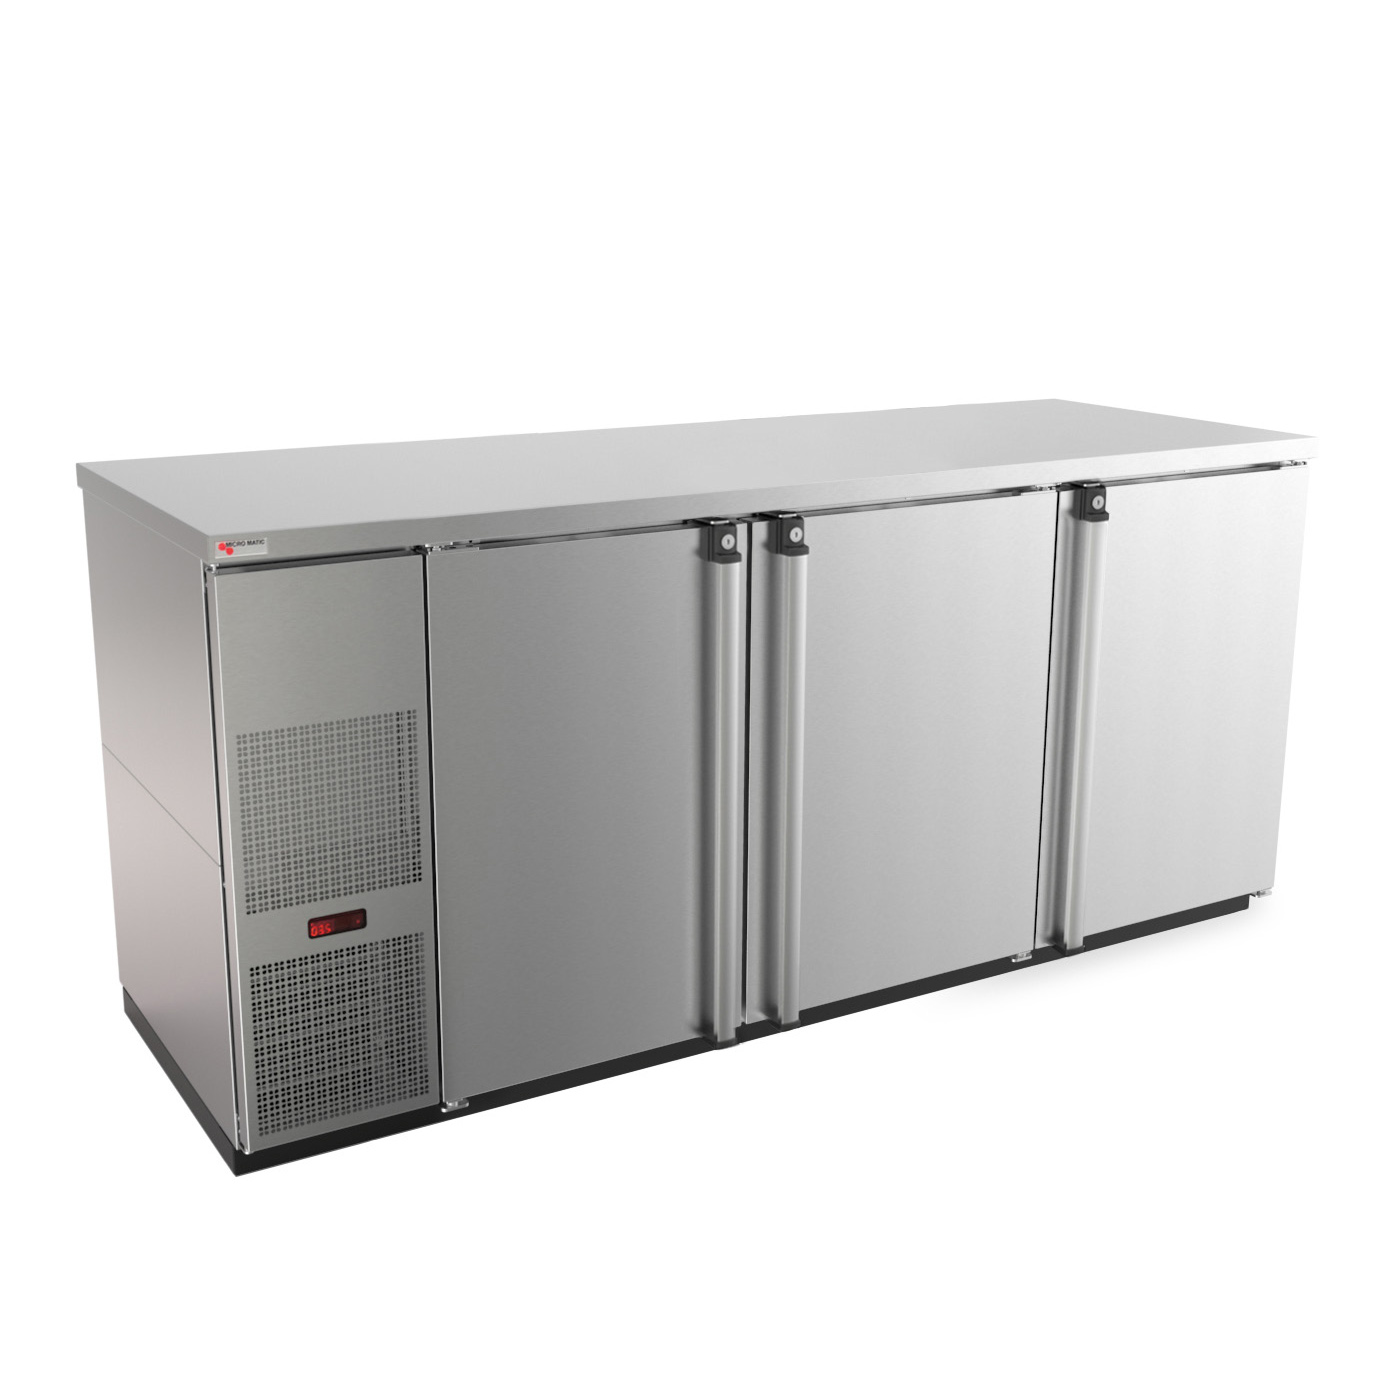 Micro Matic USA MBB78S-E back bar cabinet, refrigerated